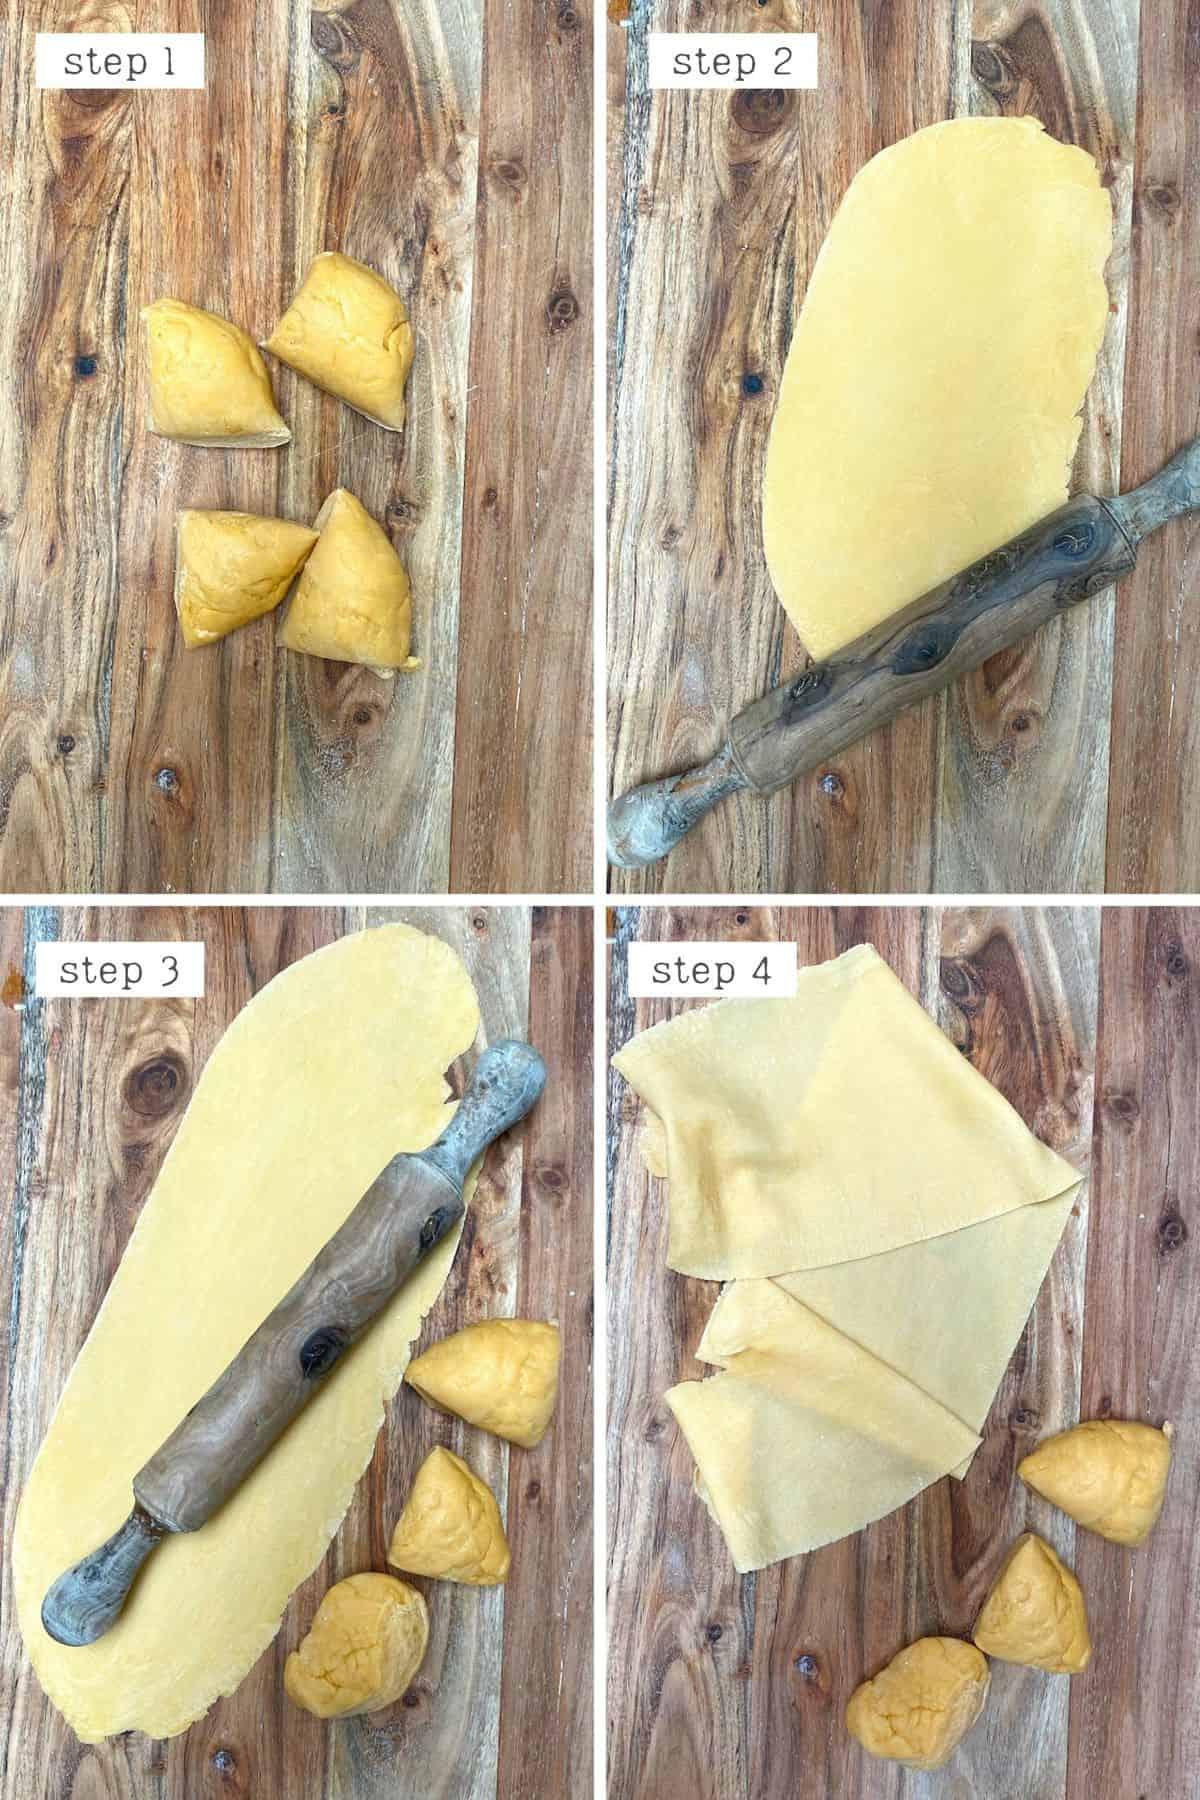 Steps for rolling ravioli dough